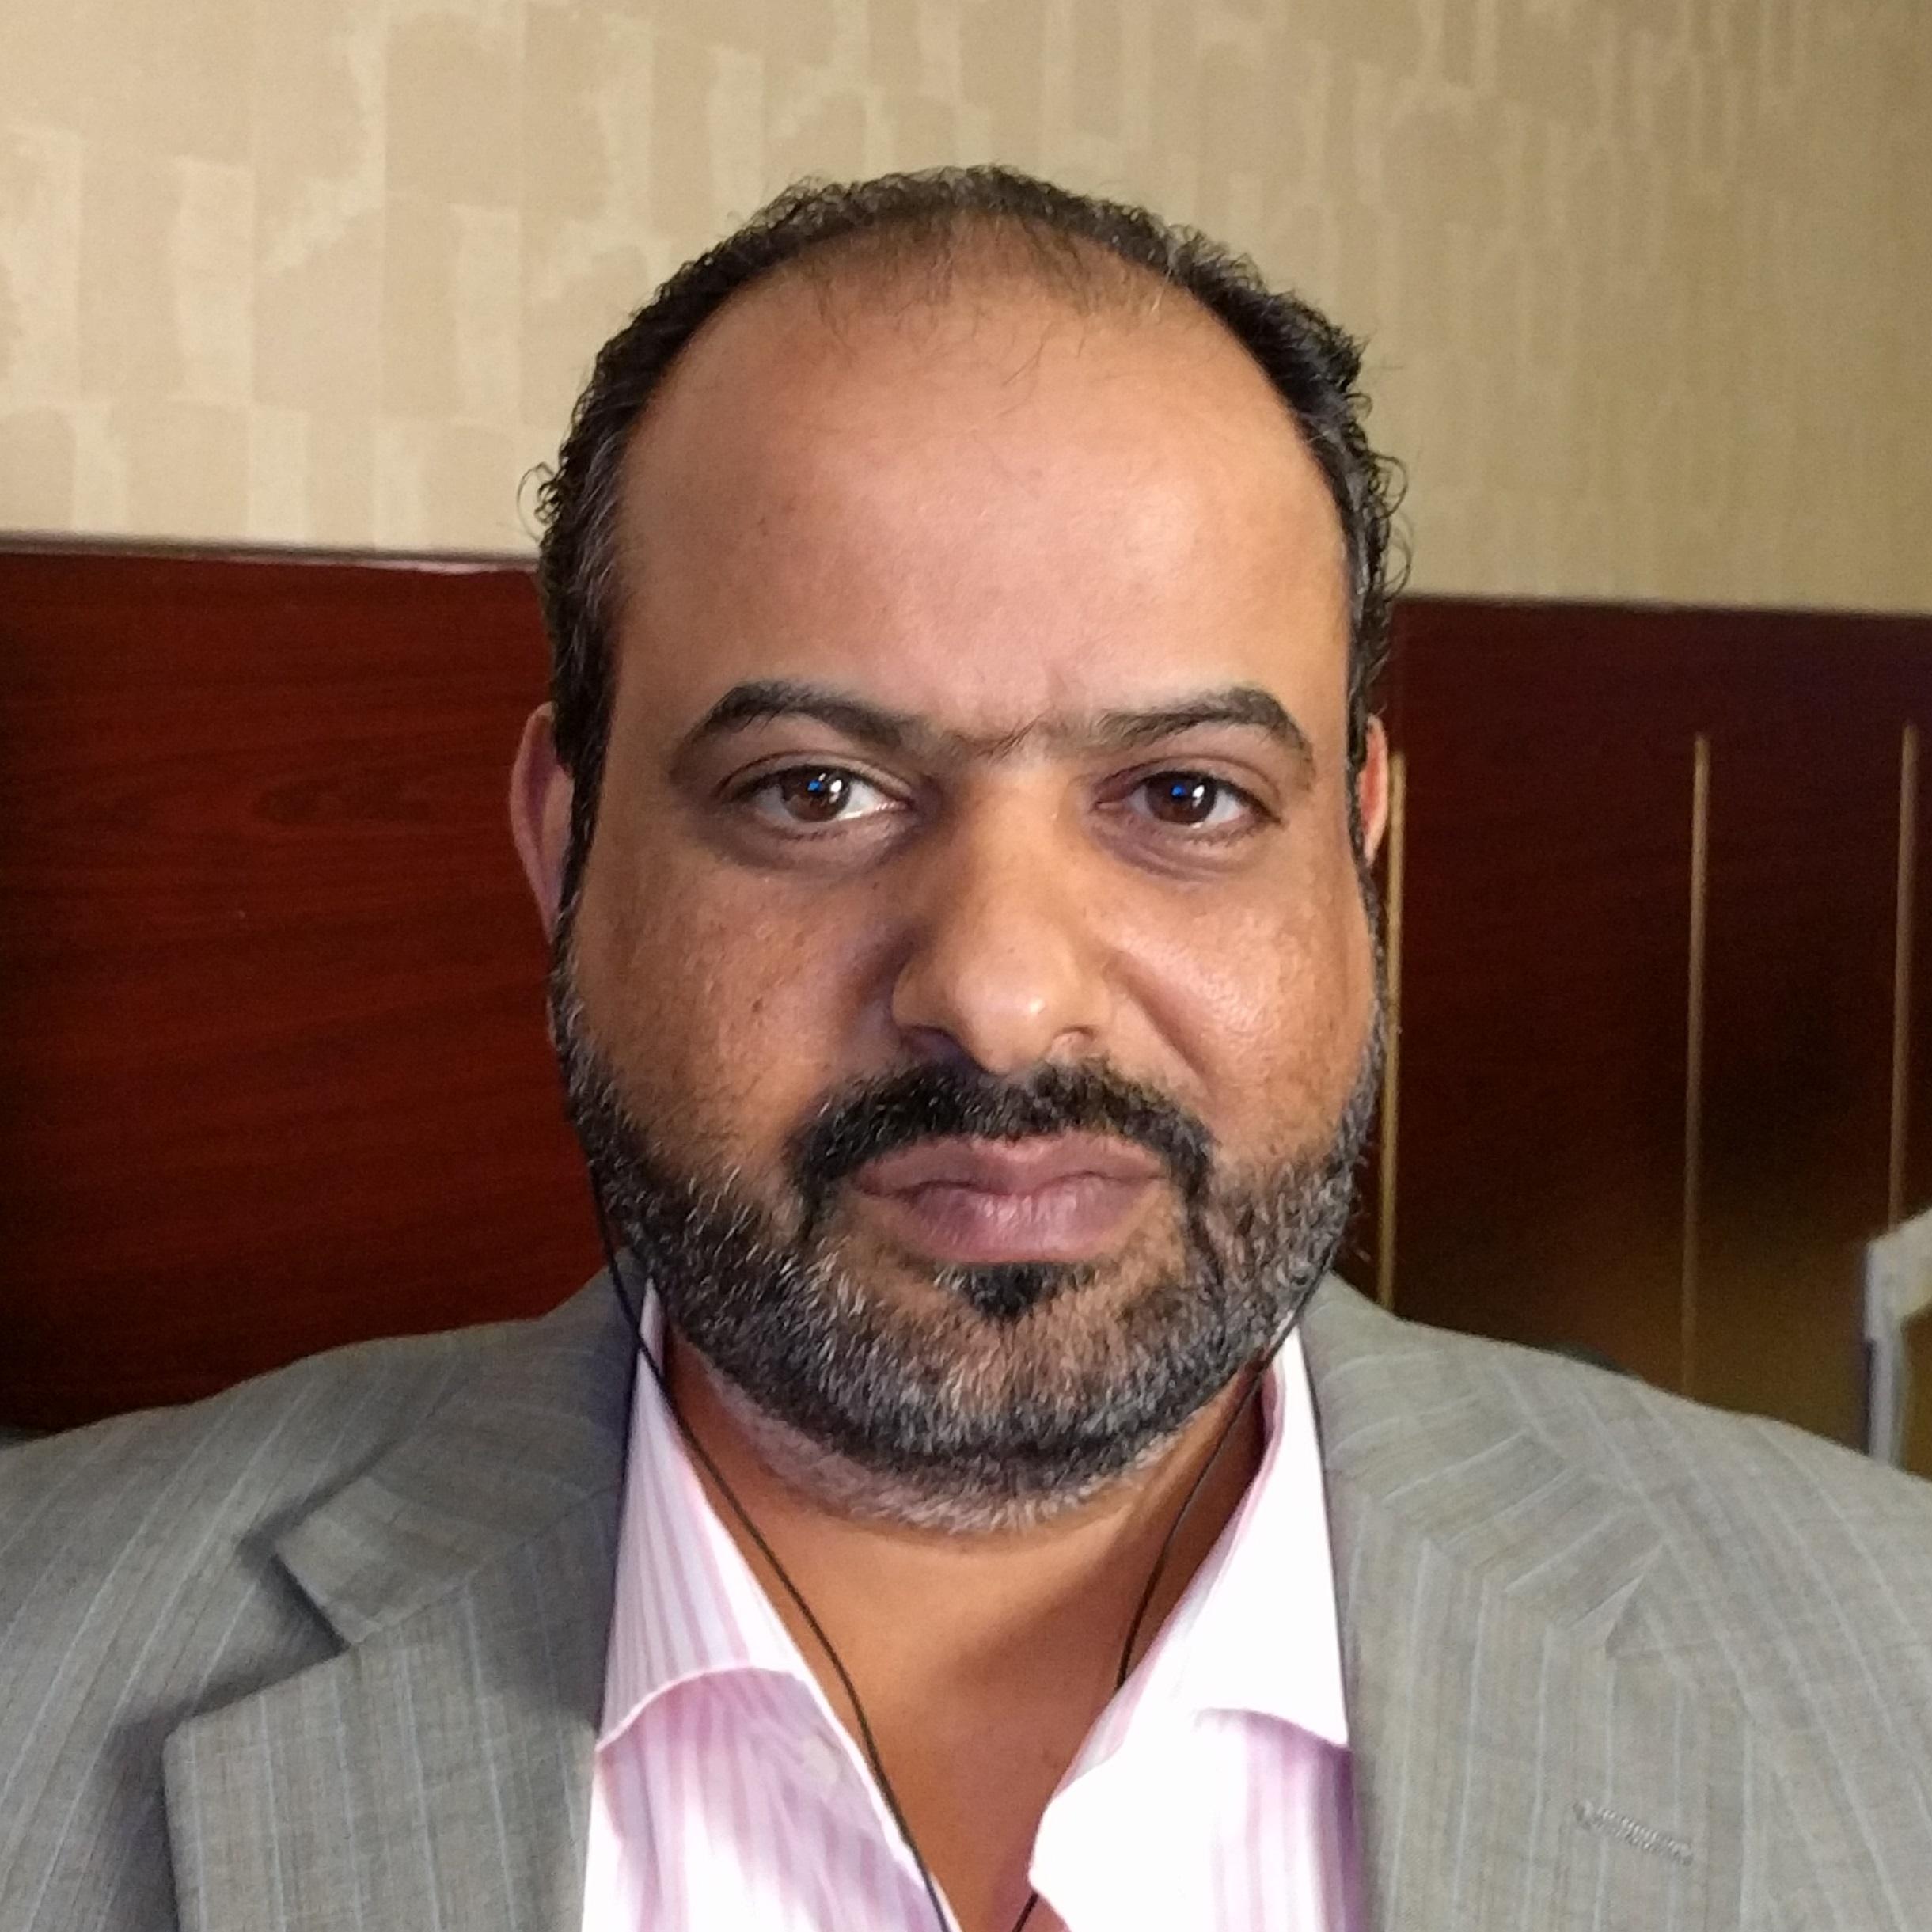 Mohammad Al - Rasheedi